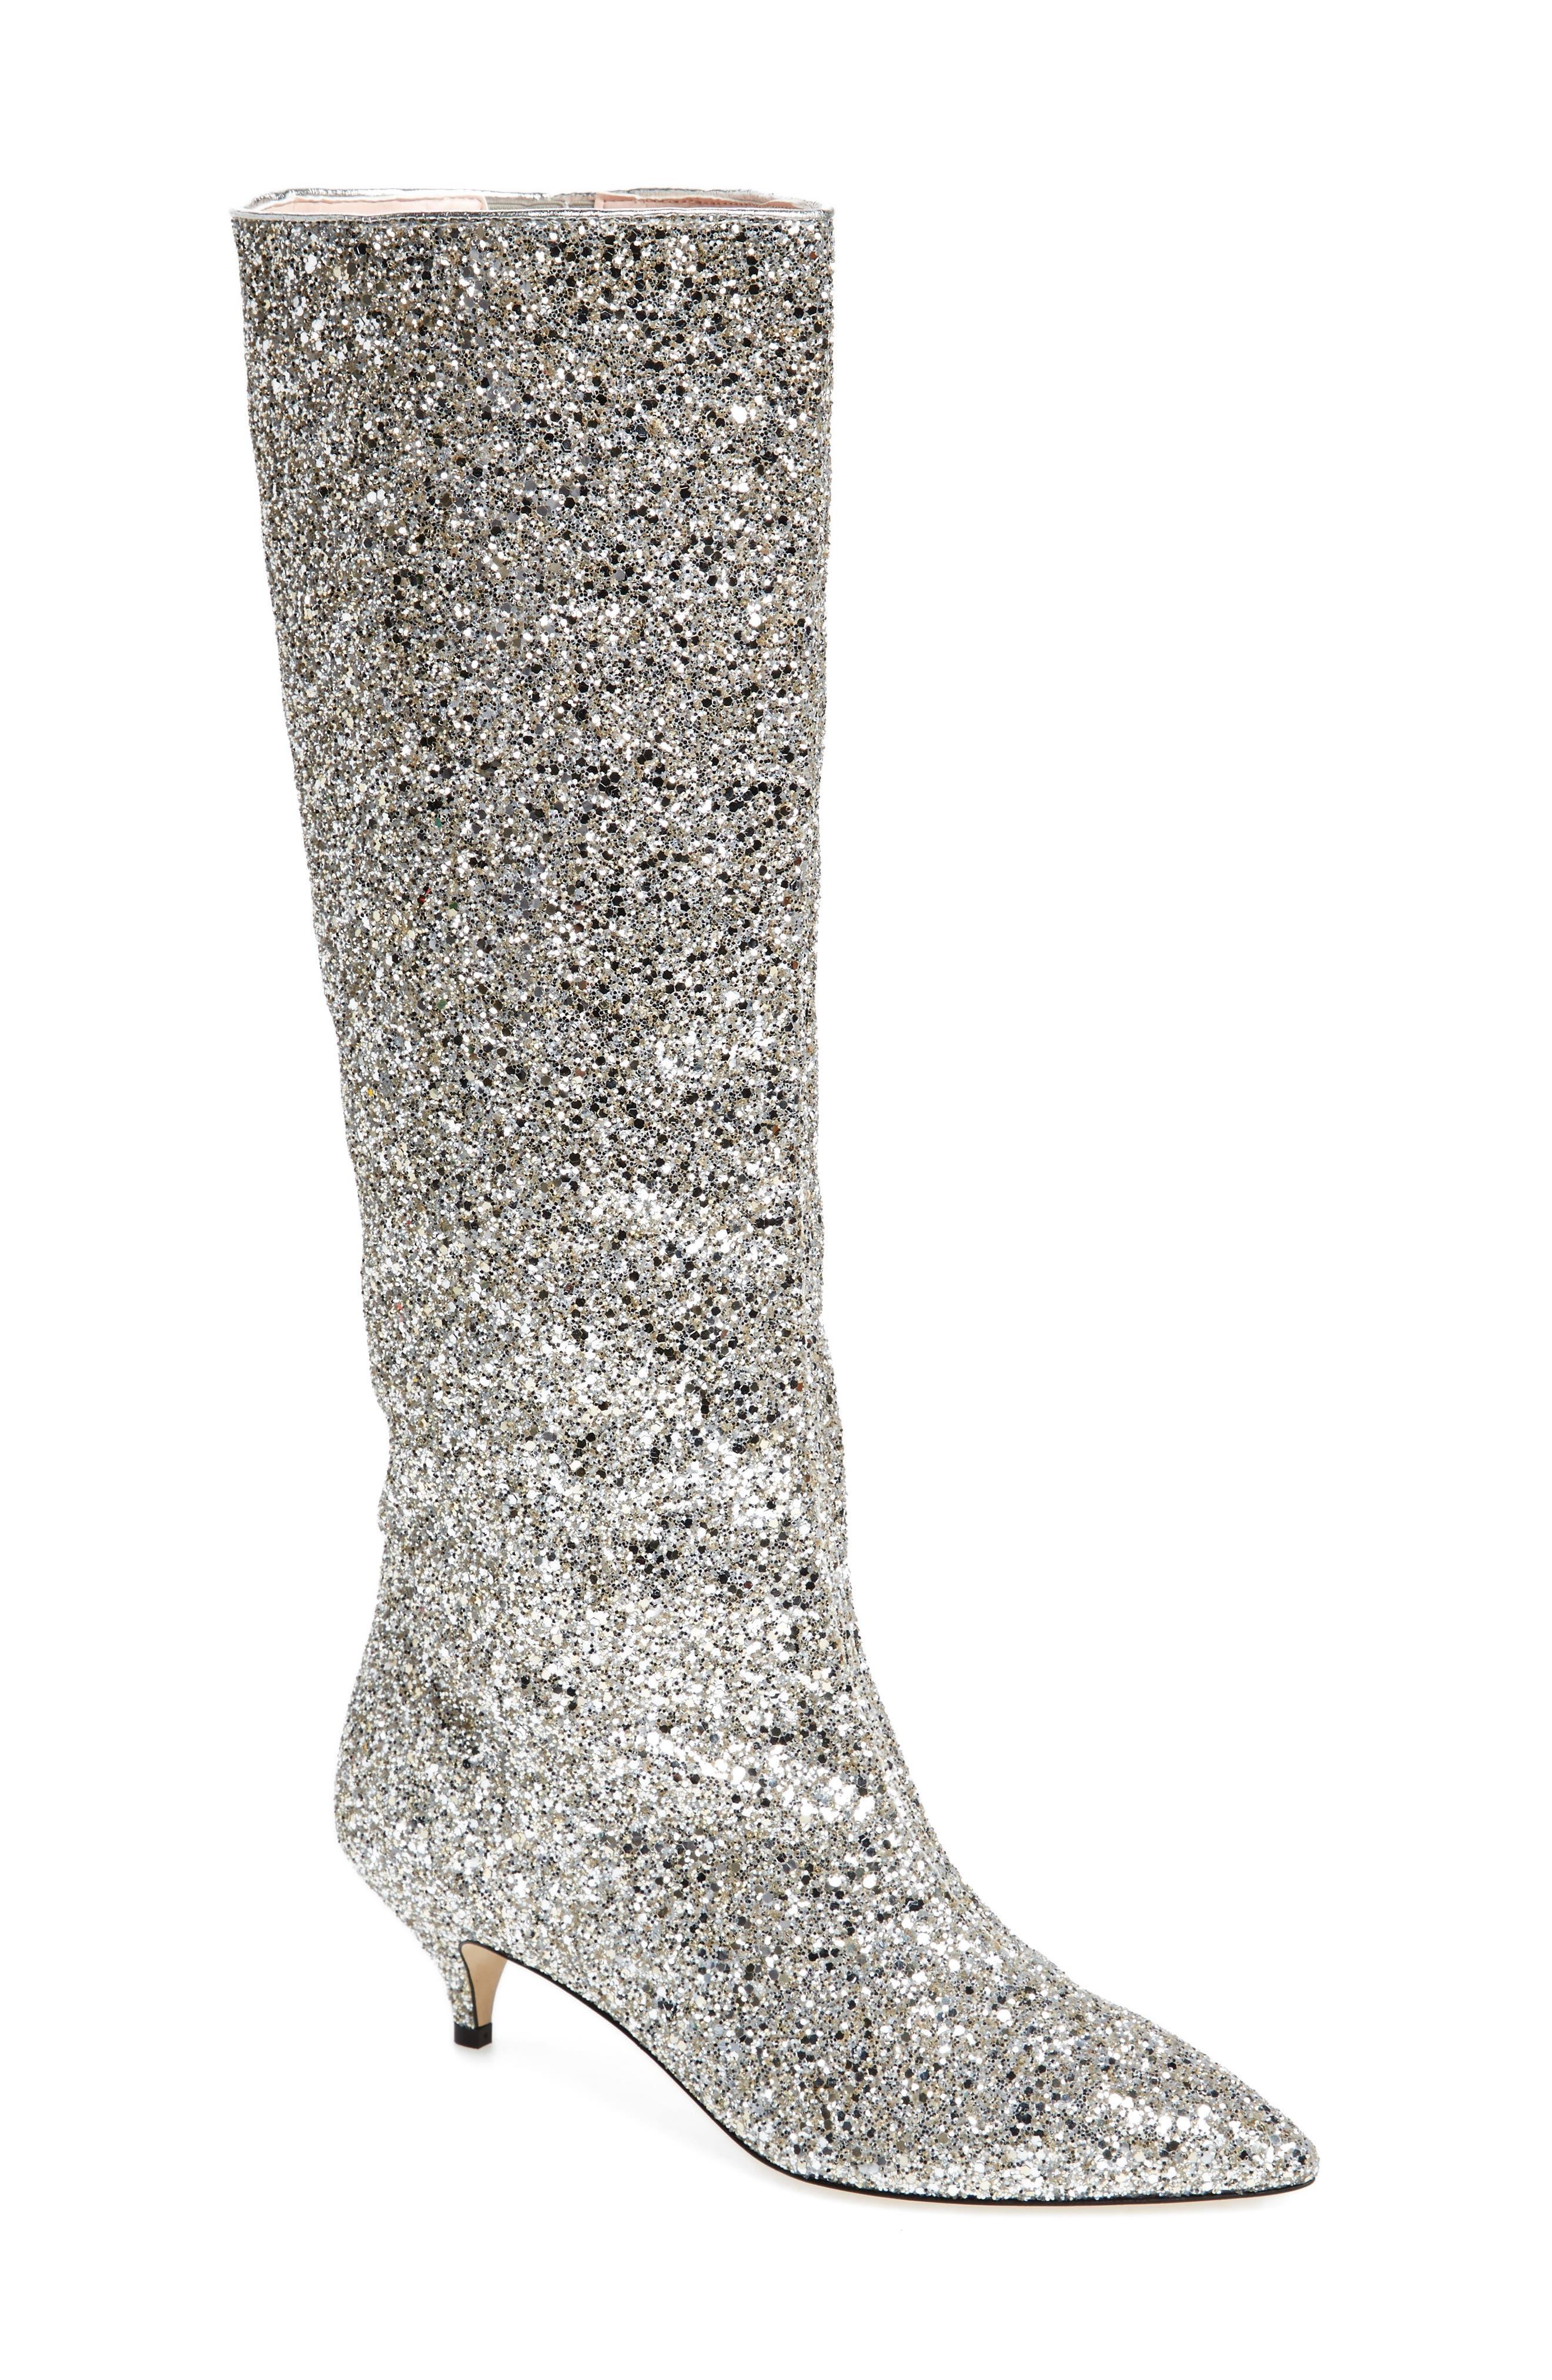 olina glitter knee high boot,                             Main thumbnail 1, color,                             710